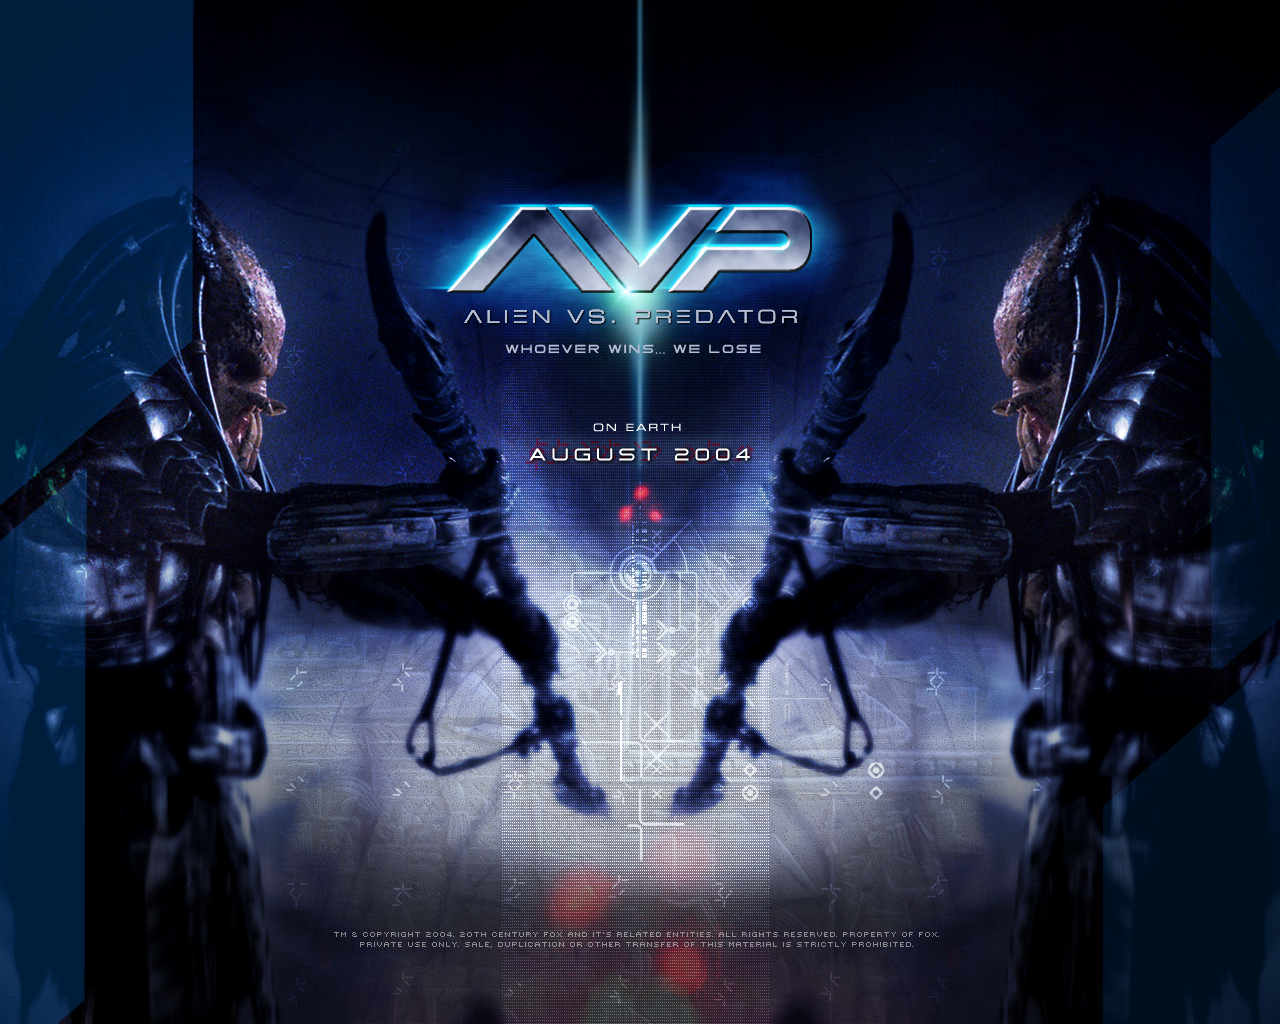 aliens vs predator online hd